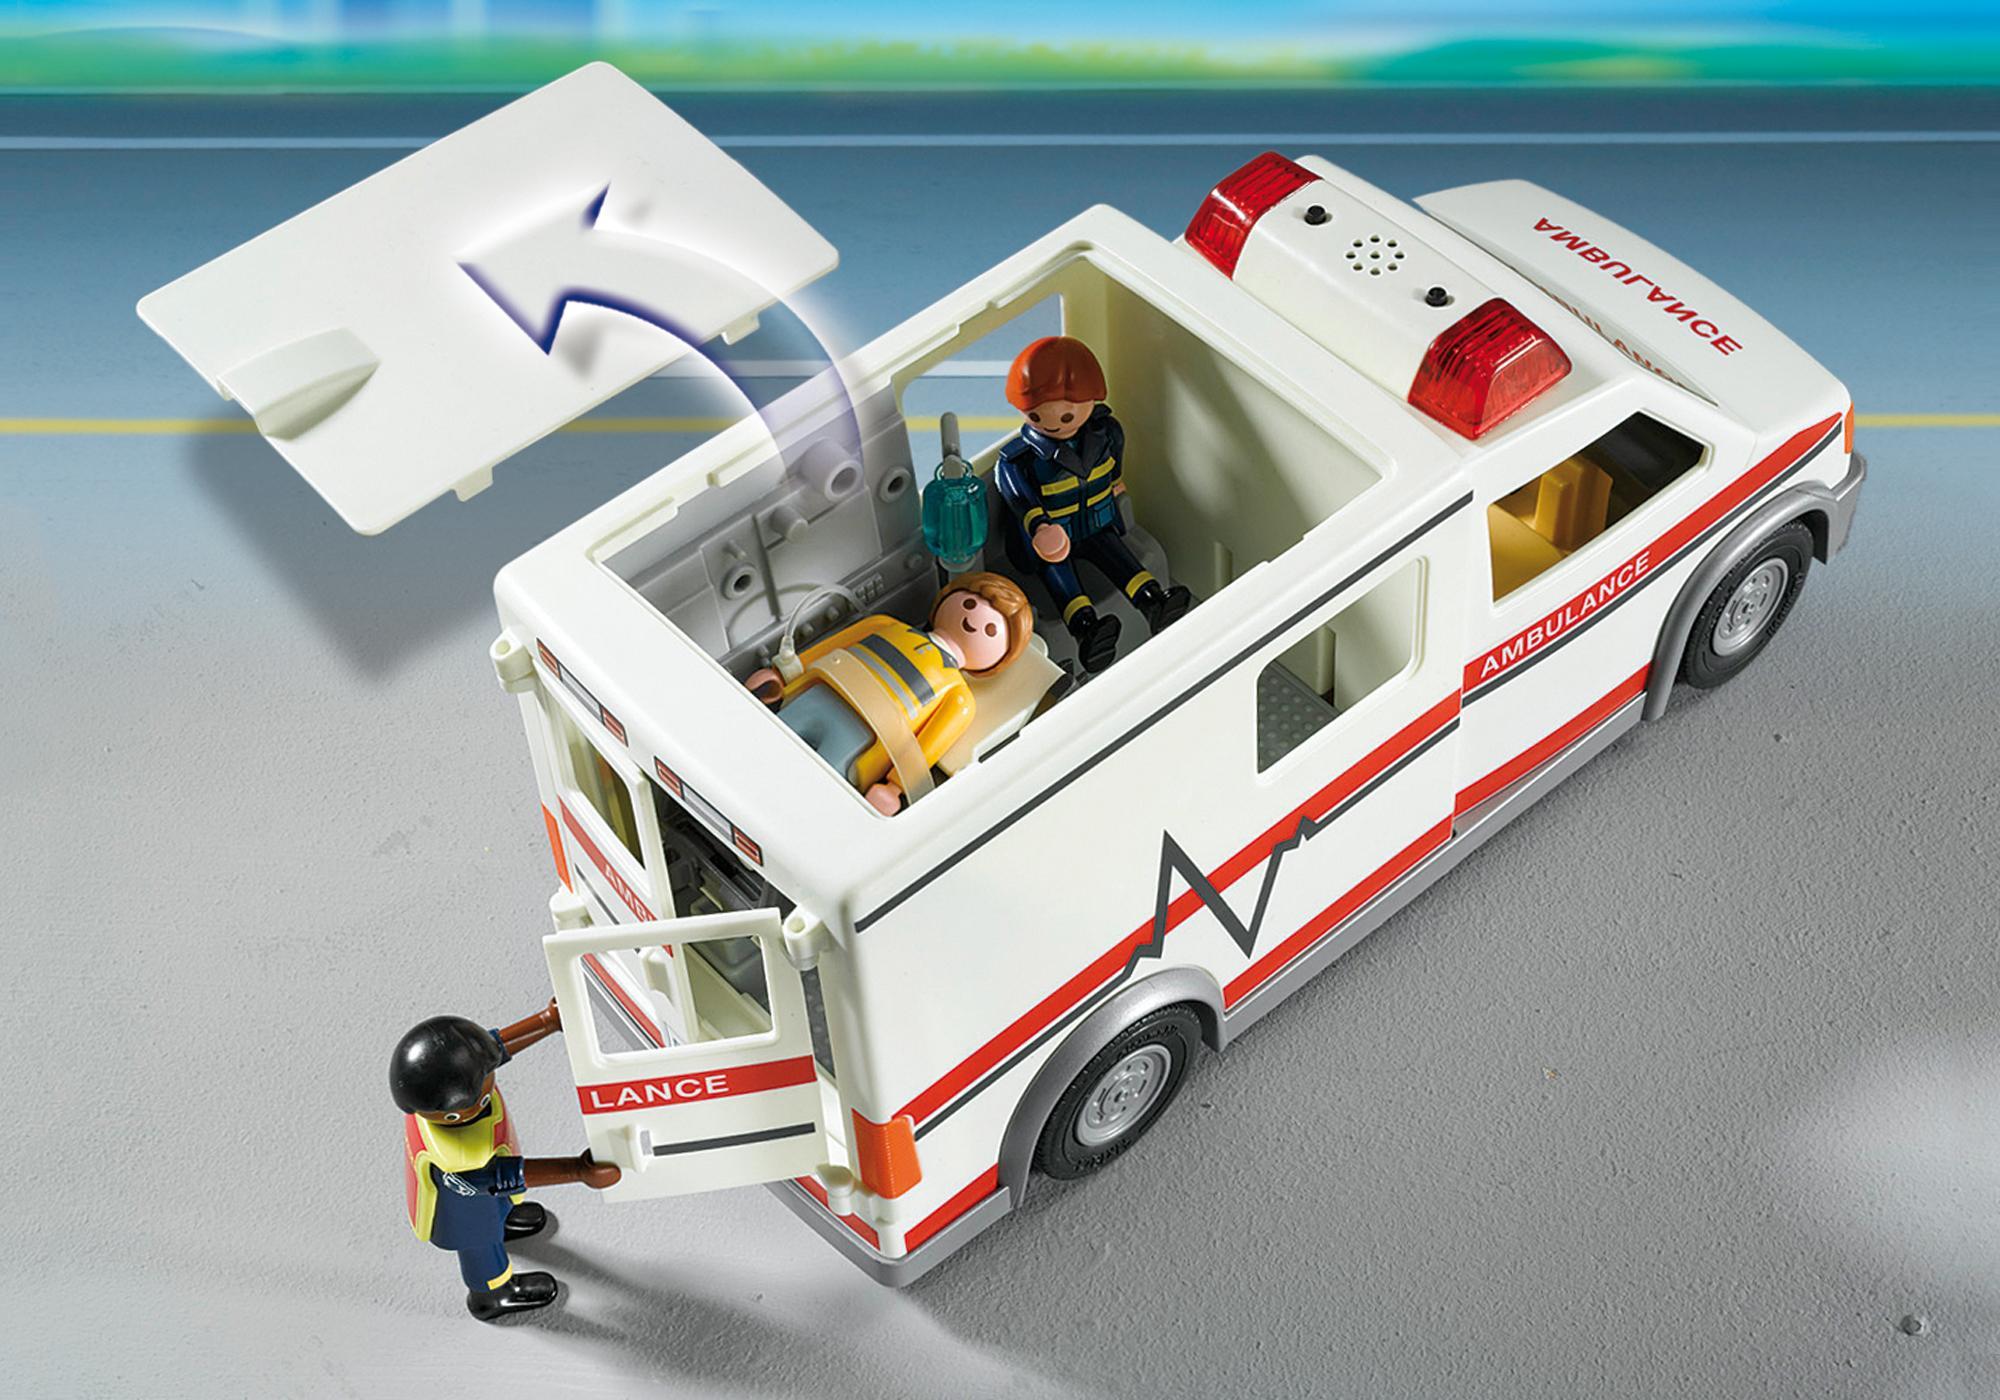 http://media.playmobil.com/i/playmobil/5681_product_extra1/Rescue Ambulance